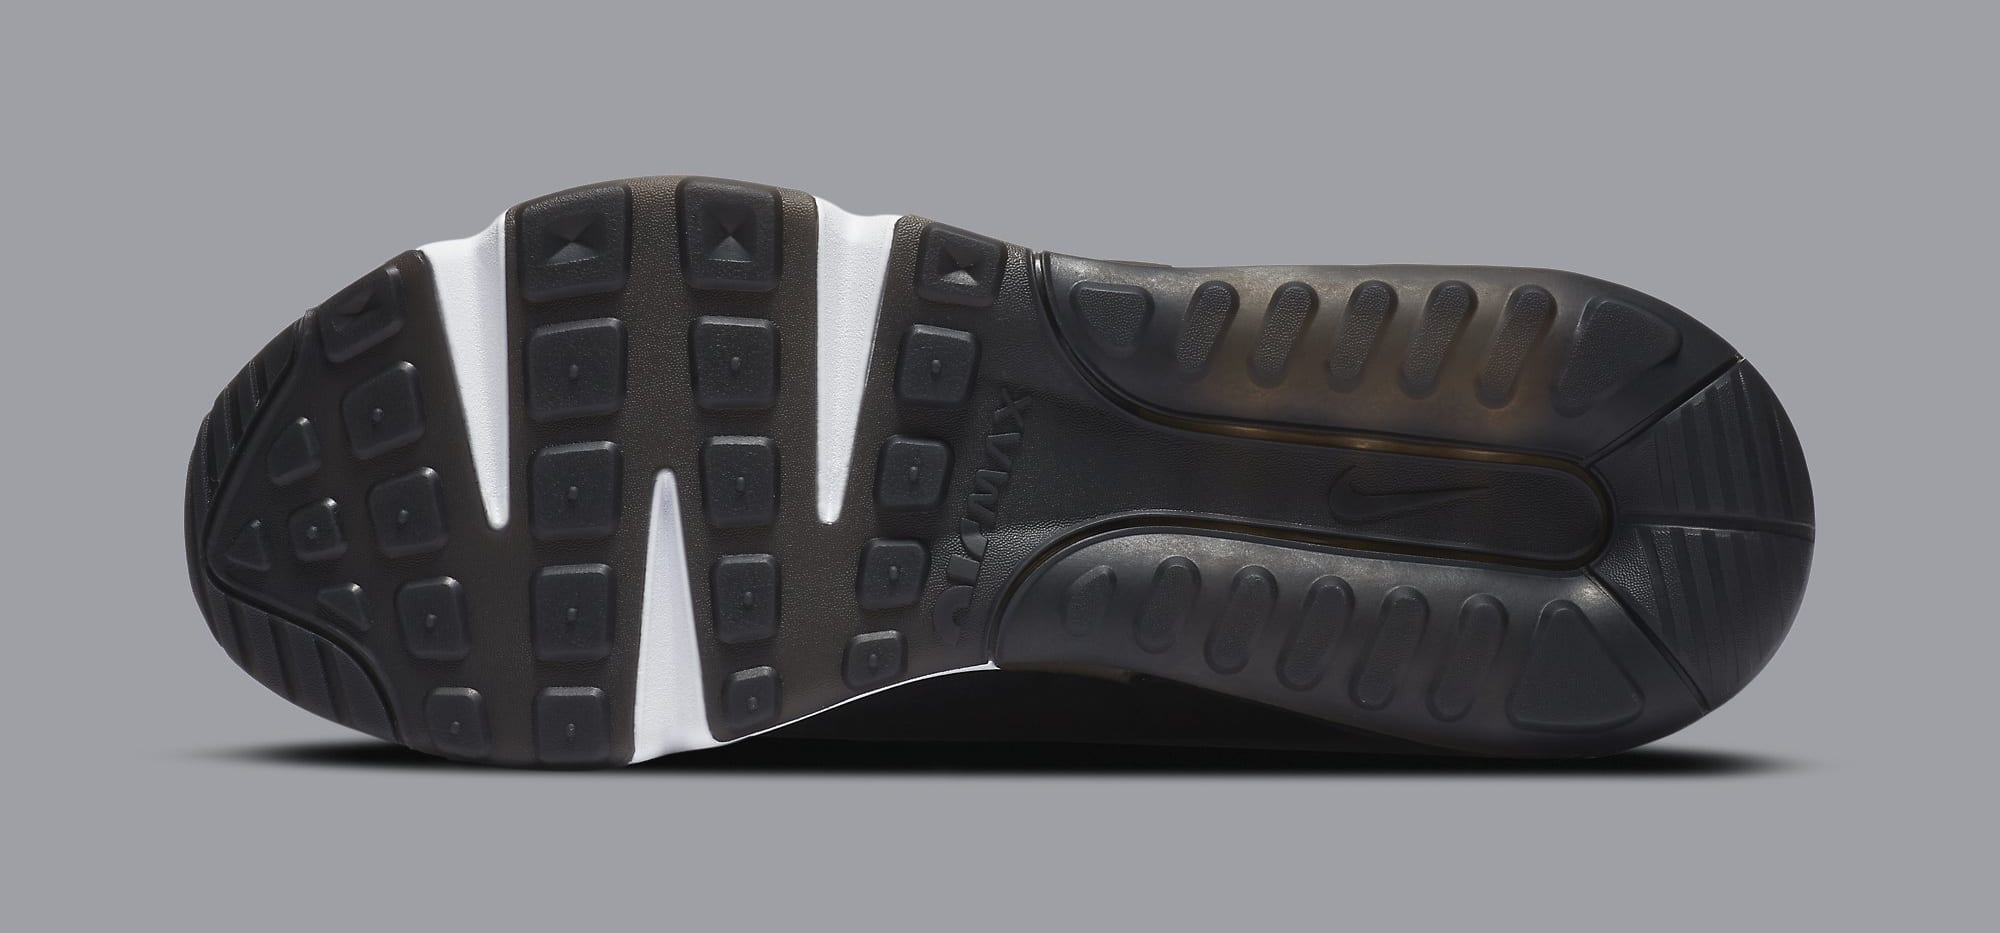 Nike Air Max 2090 'Hidden Message' CZ8698-074 Outsole